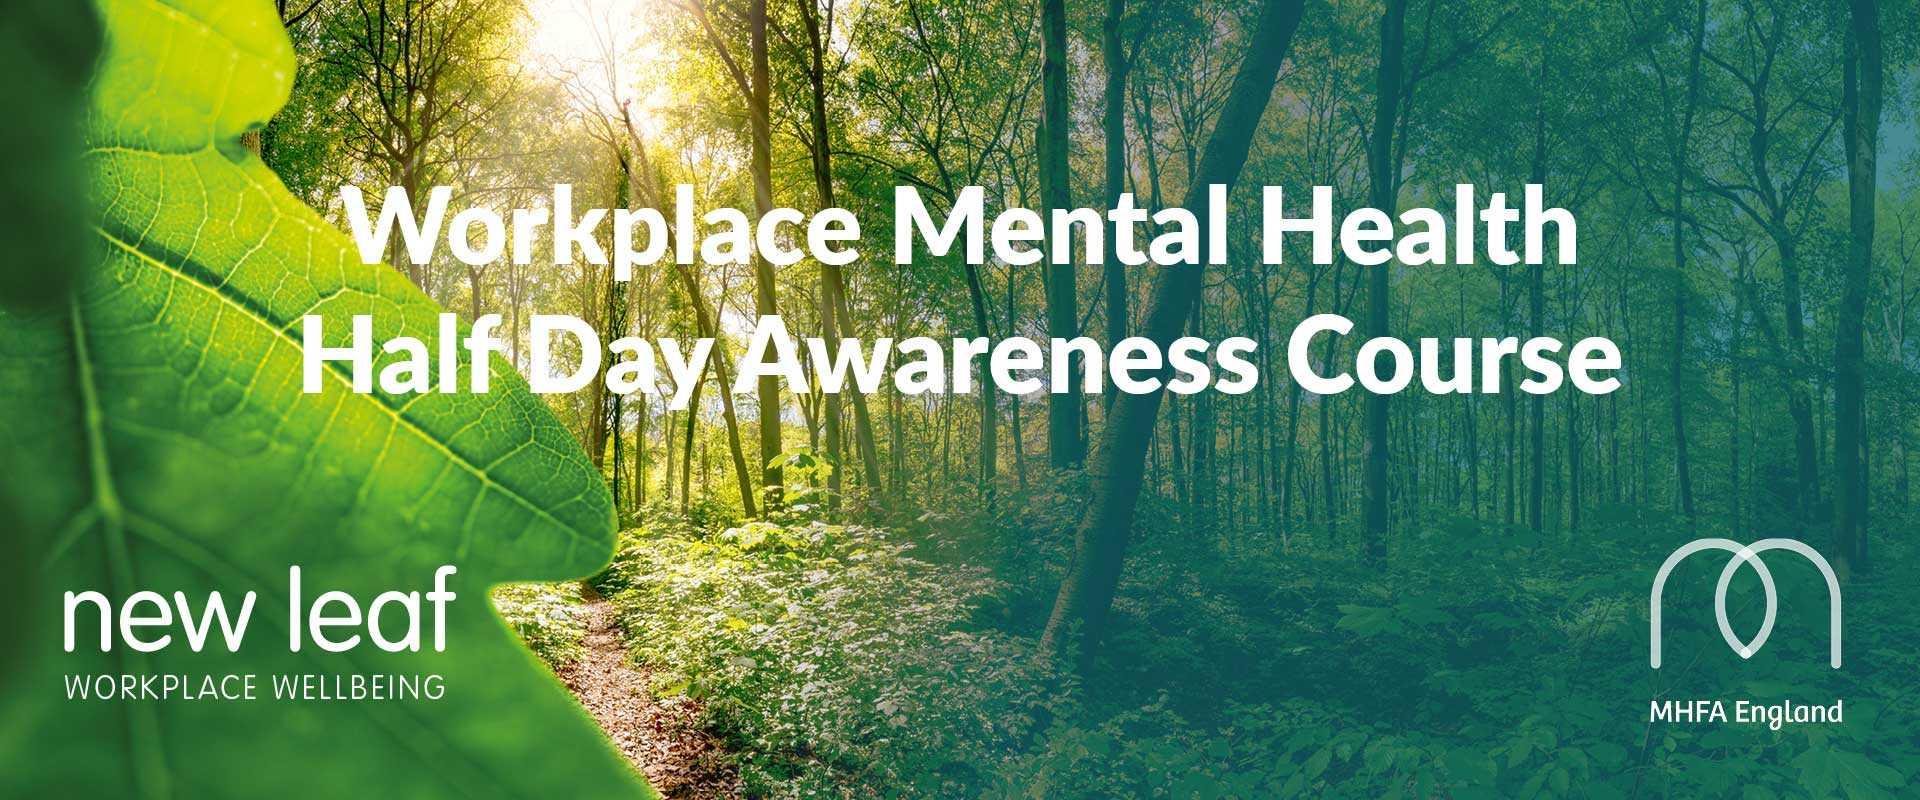 Mental Health Half Day Awareness Course